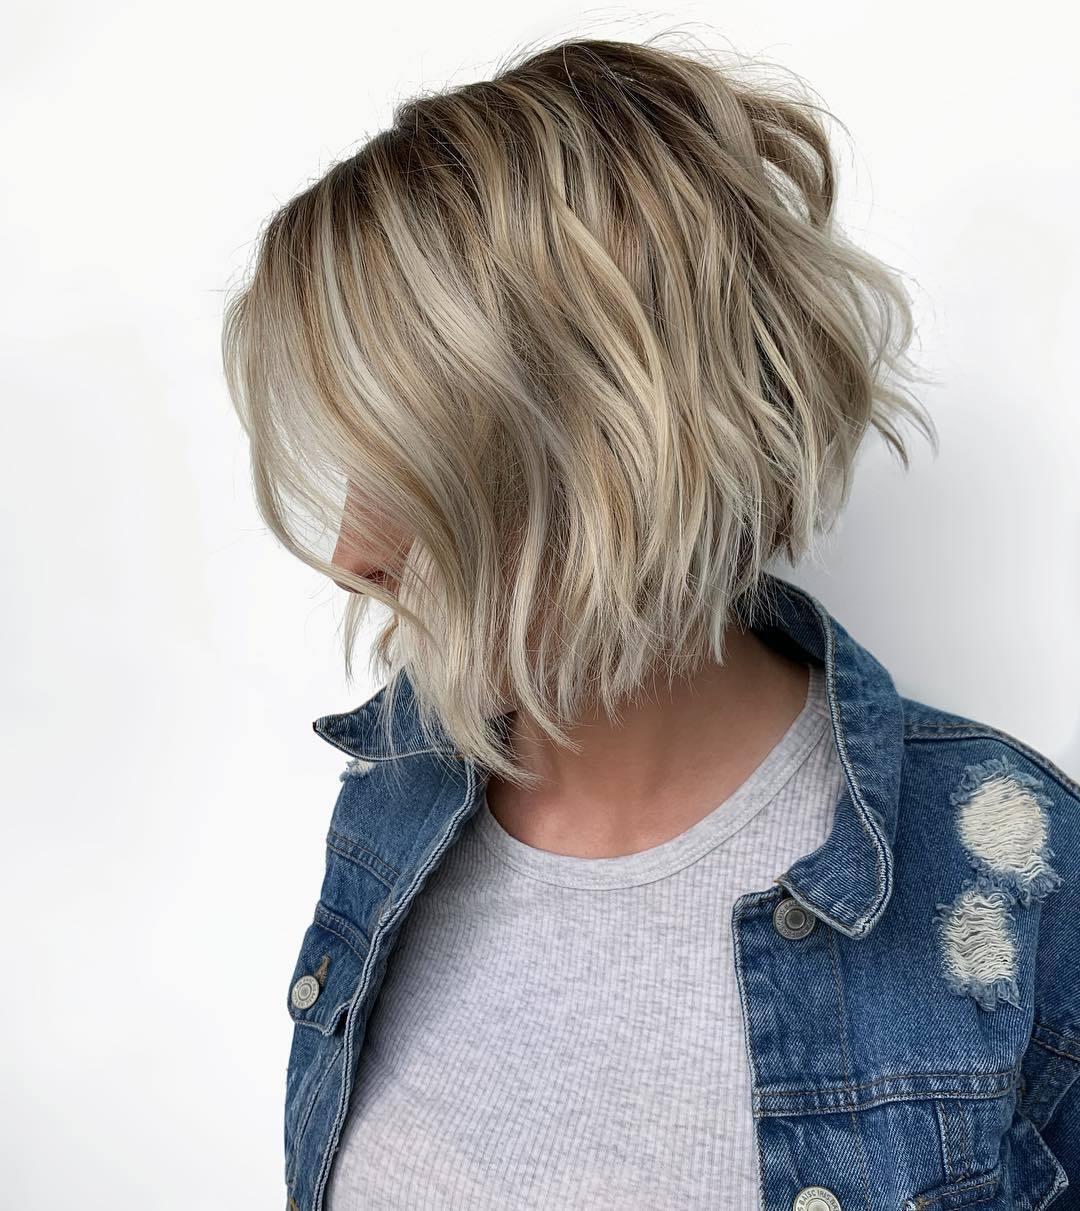 33 Hot Graduated Bob Haircuts For Women